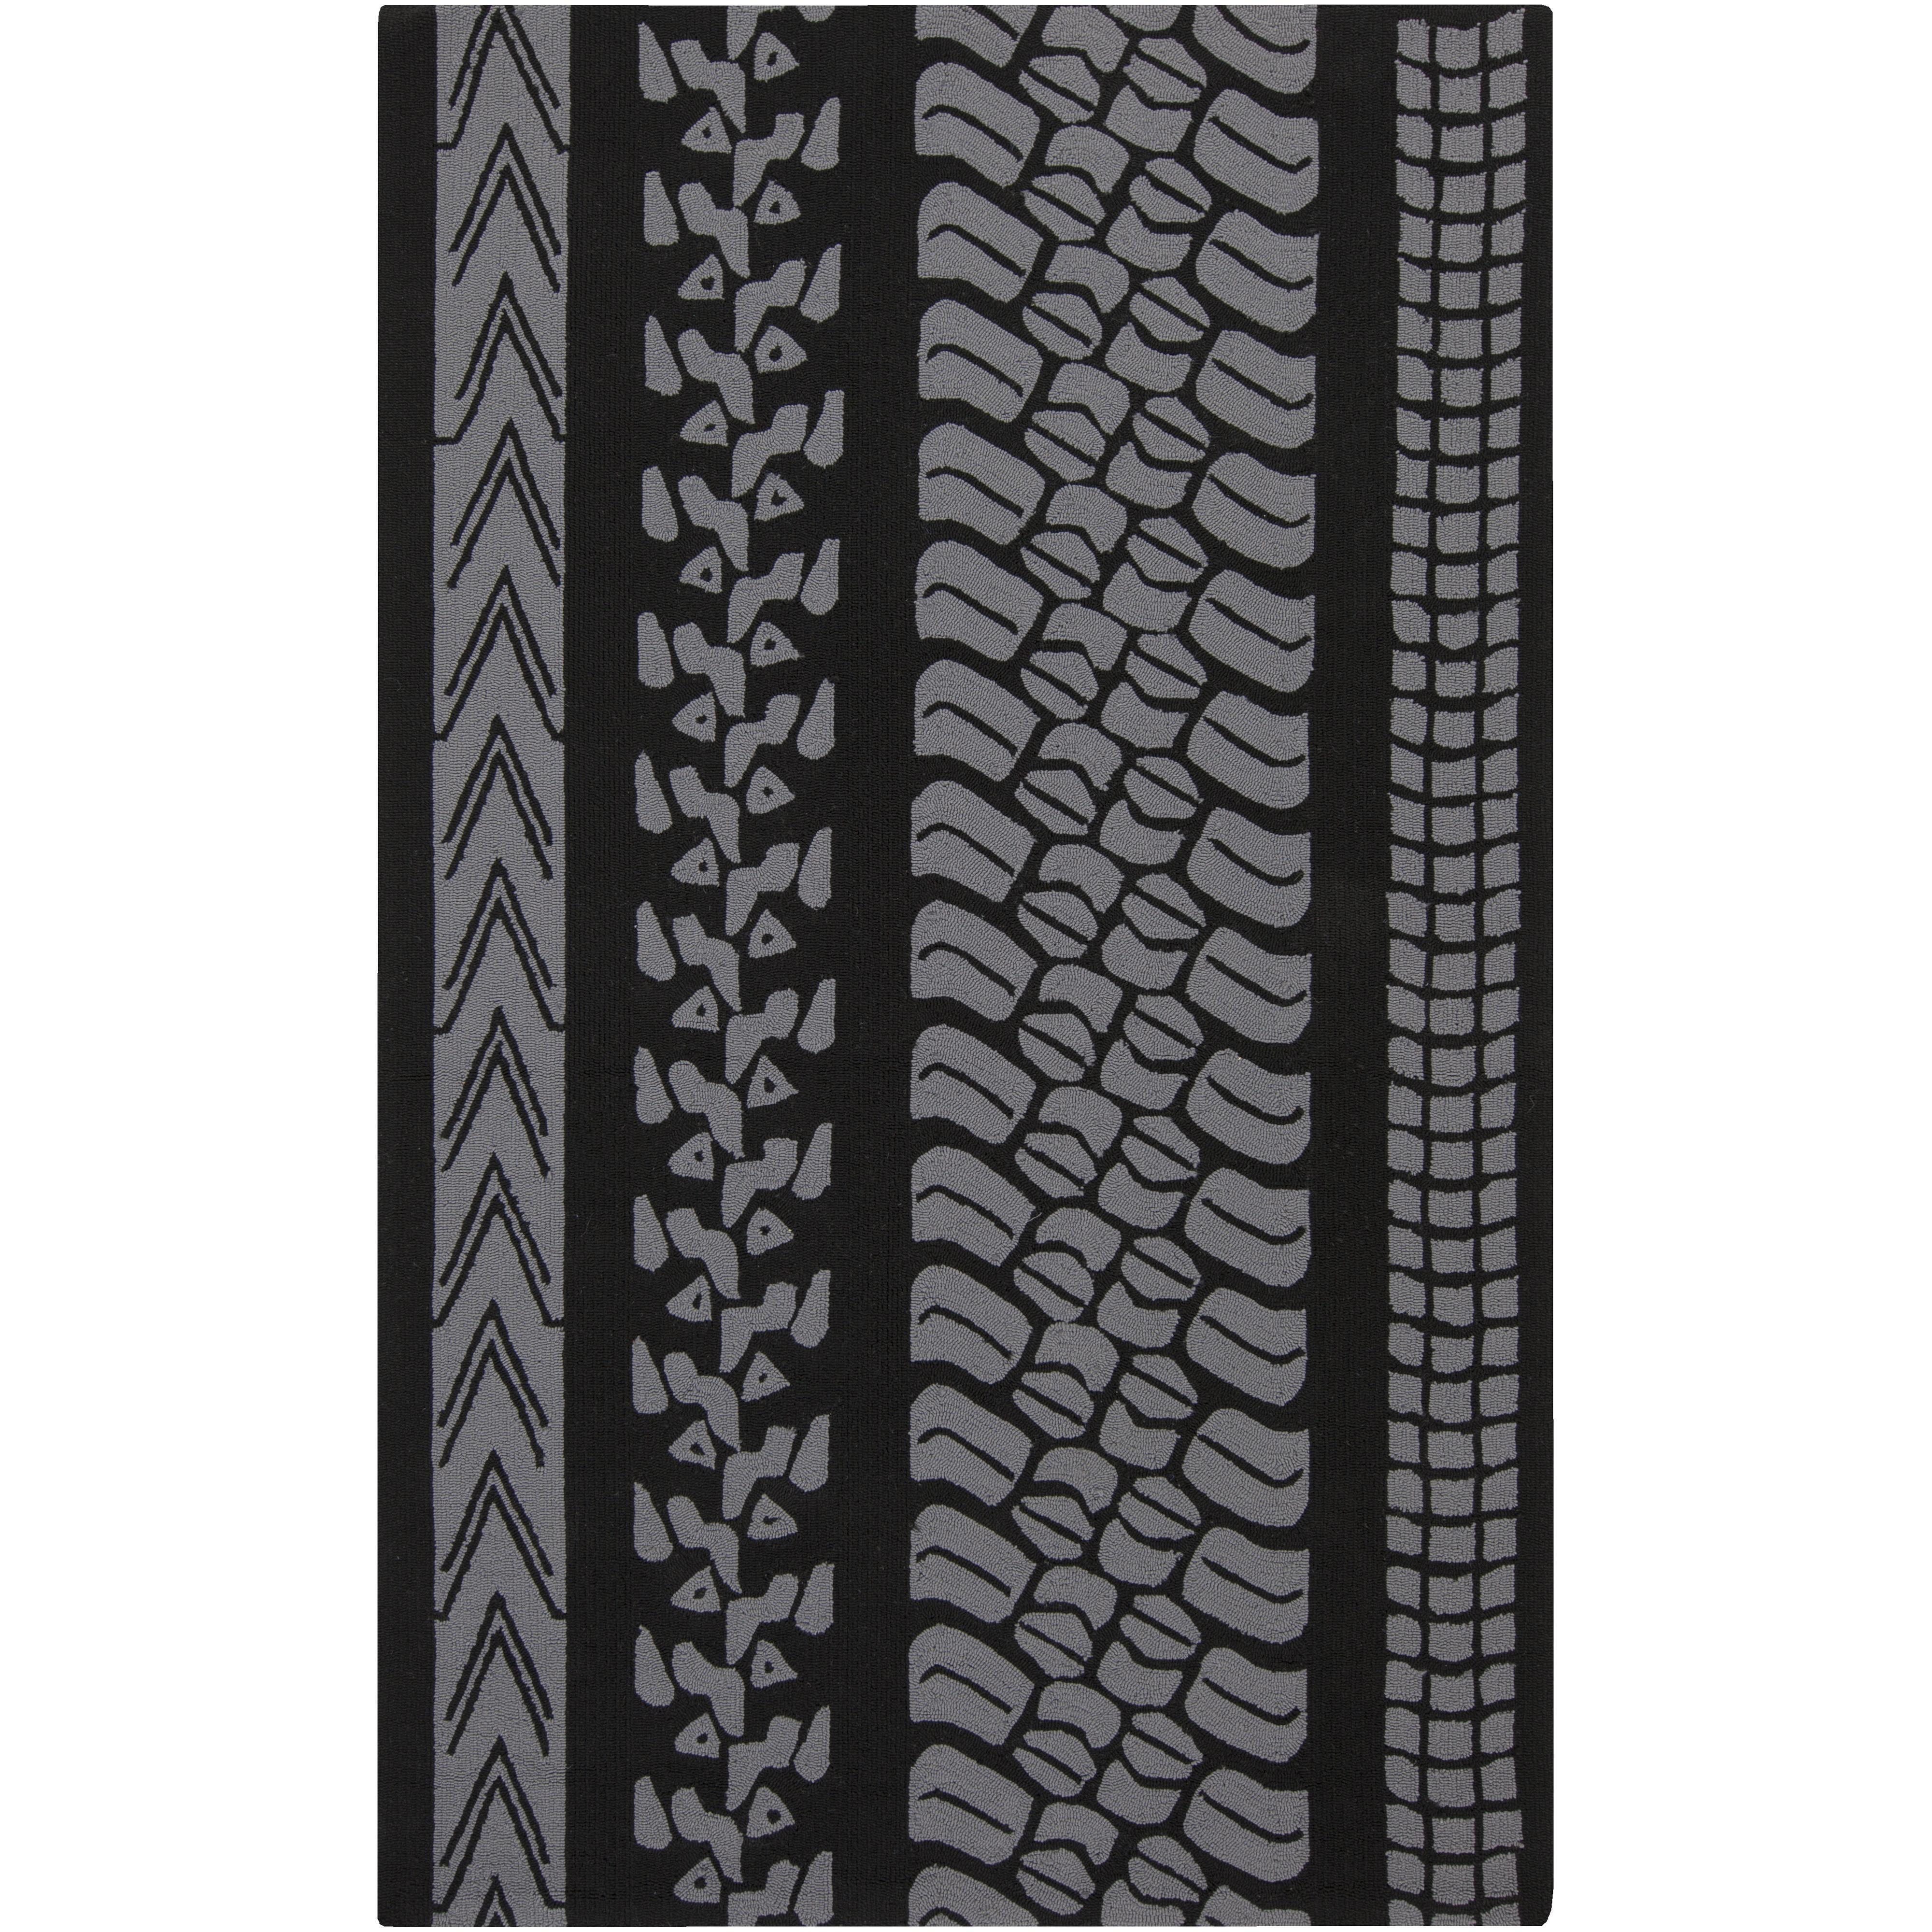 Surya Rugs Pandemonium 8' x 10' - Item Number: PDM1006-810